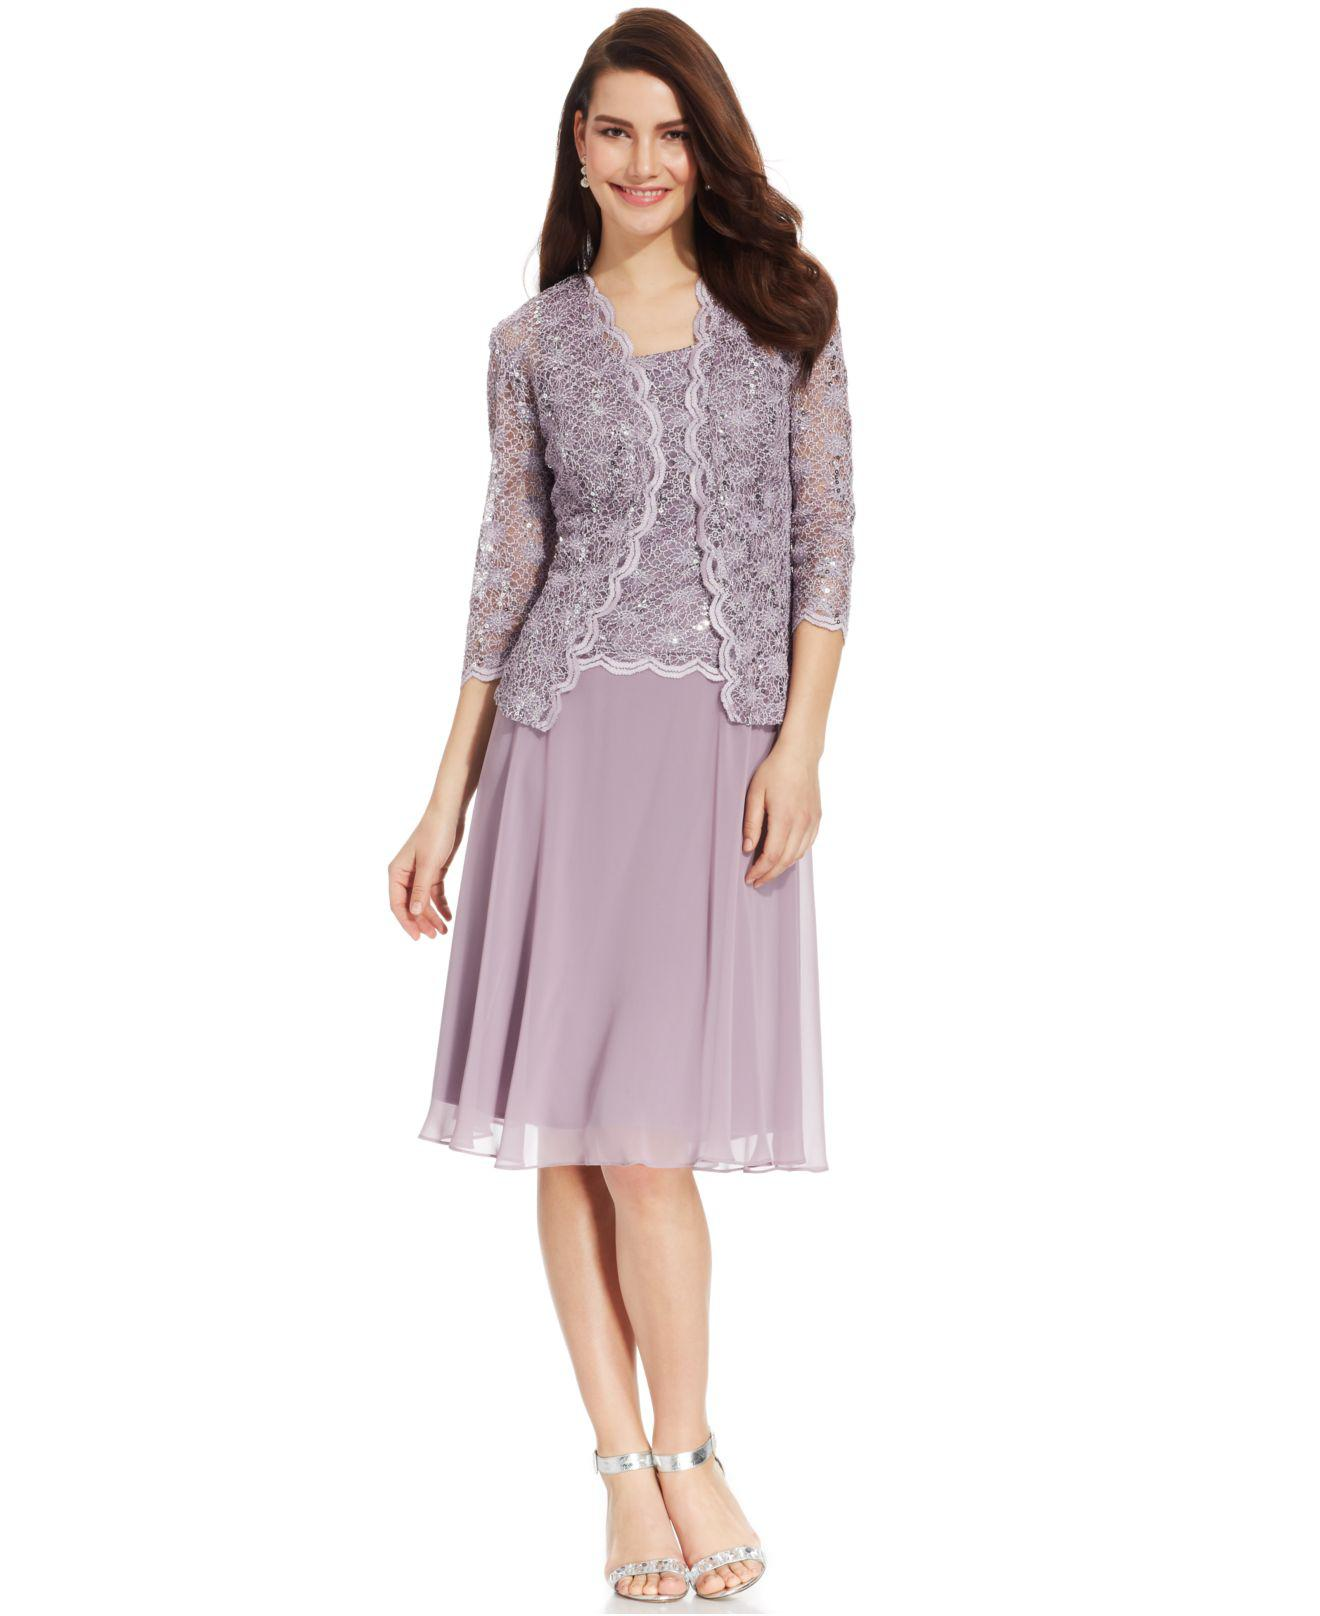 23b57a215de35 Lyst - R   M Richards R m Richards Sequined Lace Chiffon Dress And ...